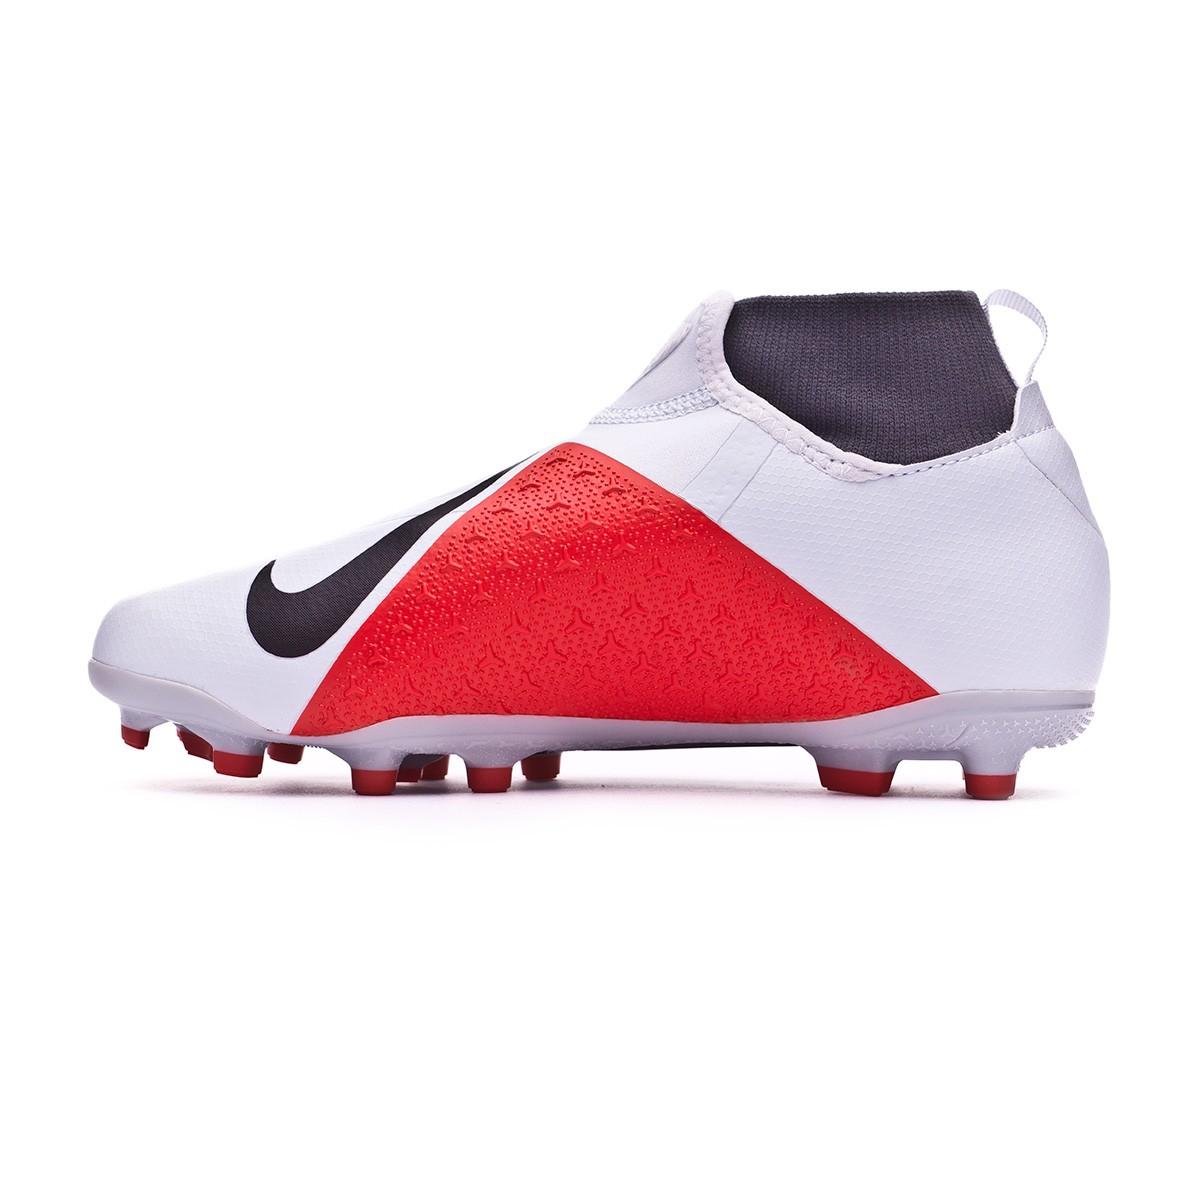 best website 0589a b272d Football Boots Nike Kids Phantom Vision Academy DF MG Pure platinum-Black-Light  crimson-Dark grey - Tienda de fútbol Fútbol Emotion